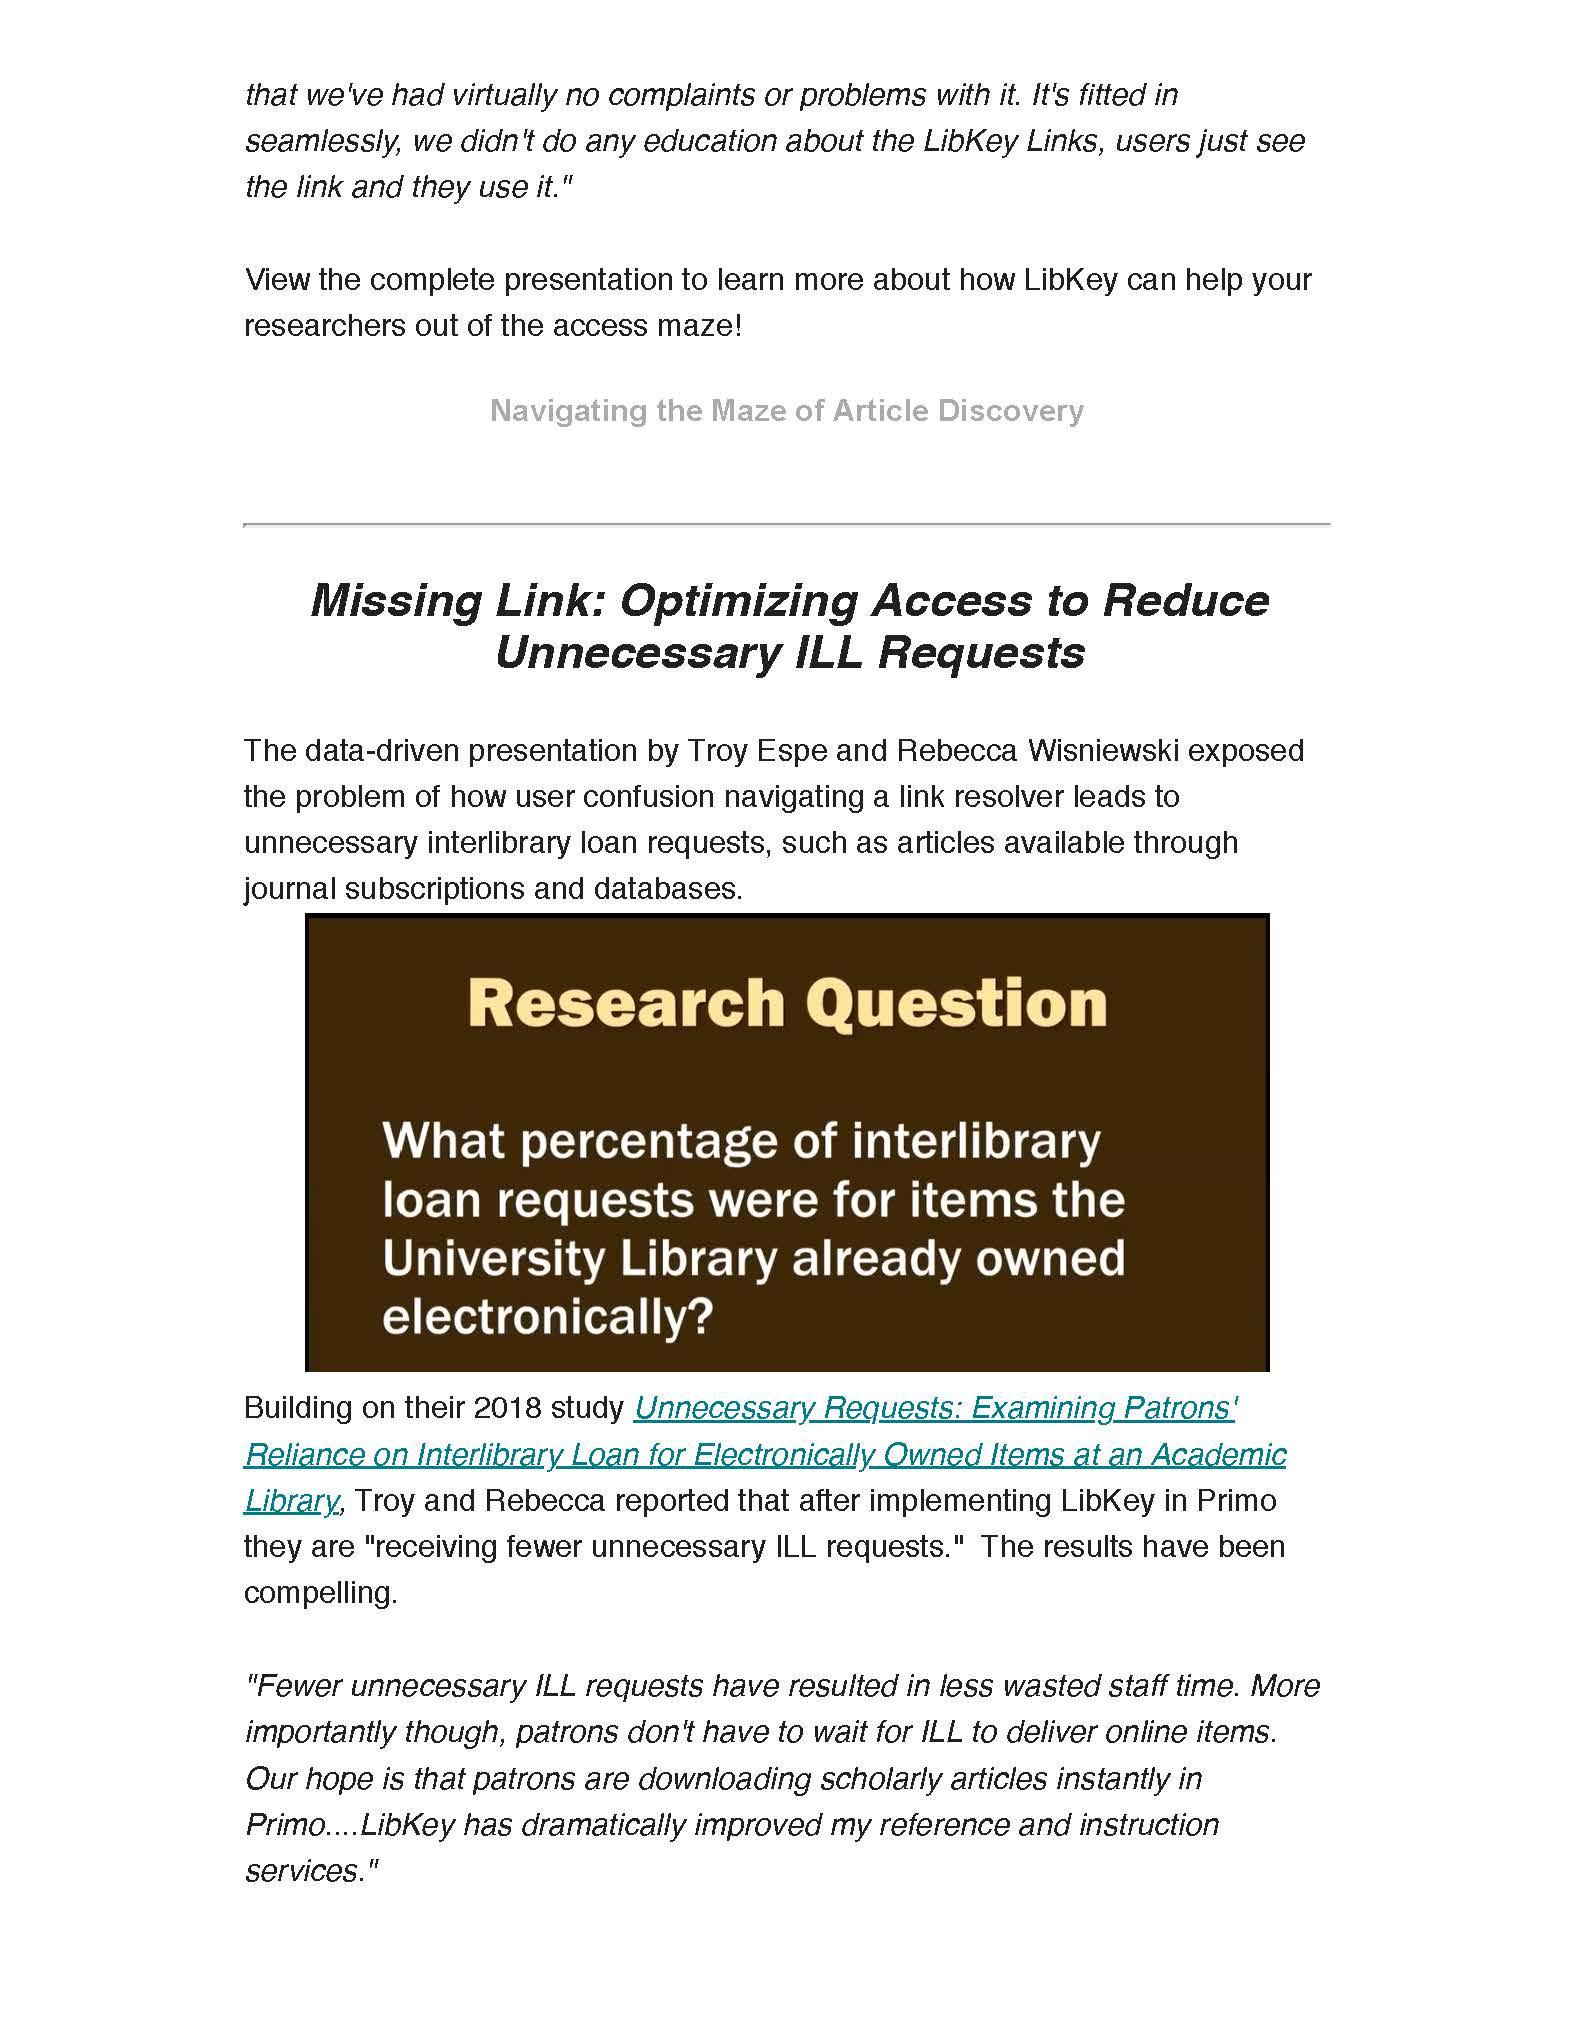 Third Iron Newsletter 10-19-2020_Page_3